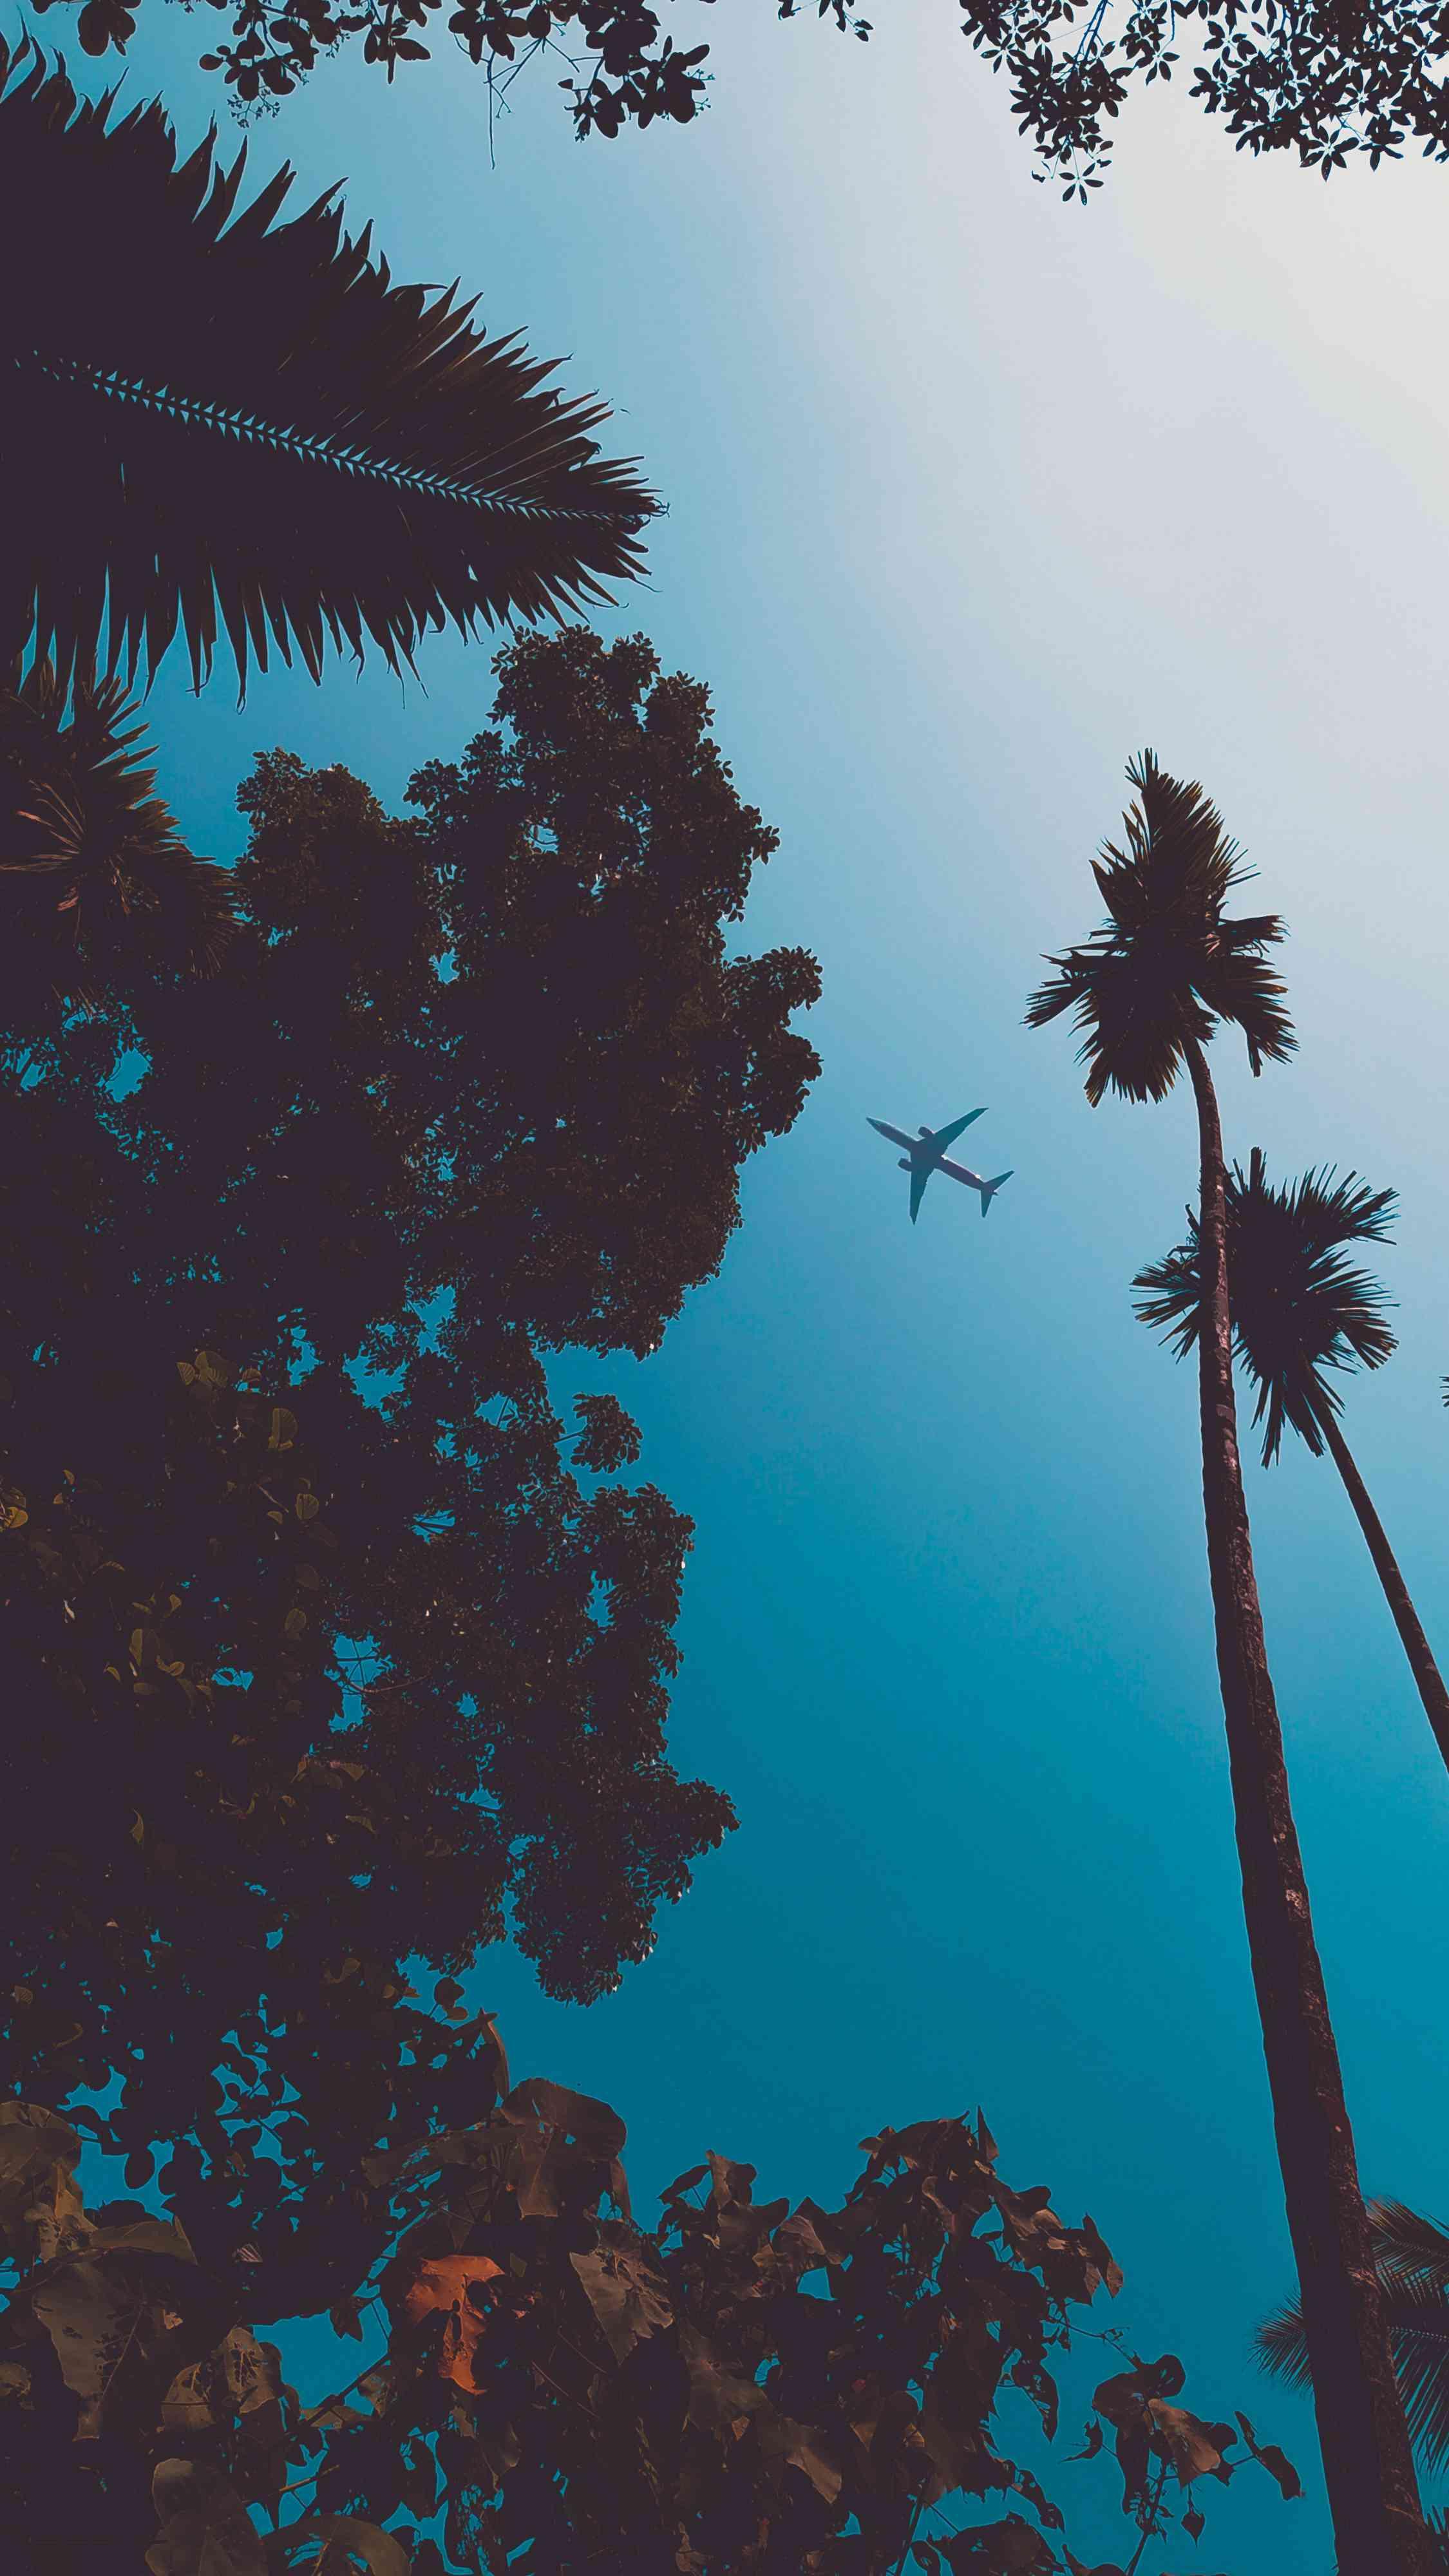 Plane in Sky Nature iPhone Wallpaper